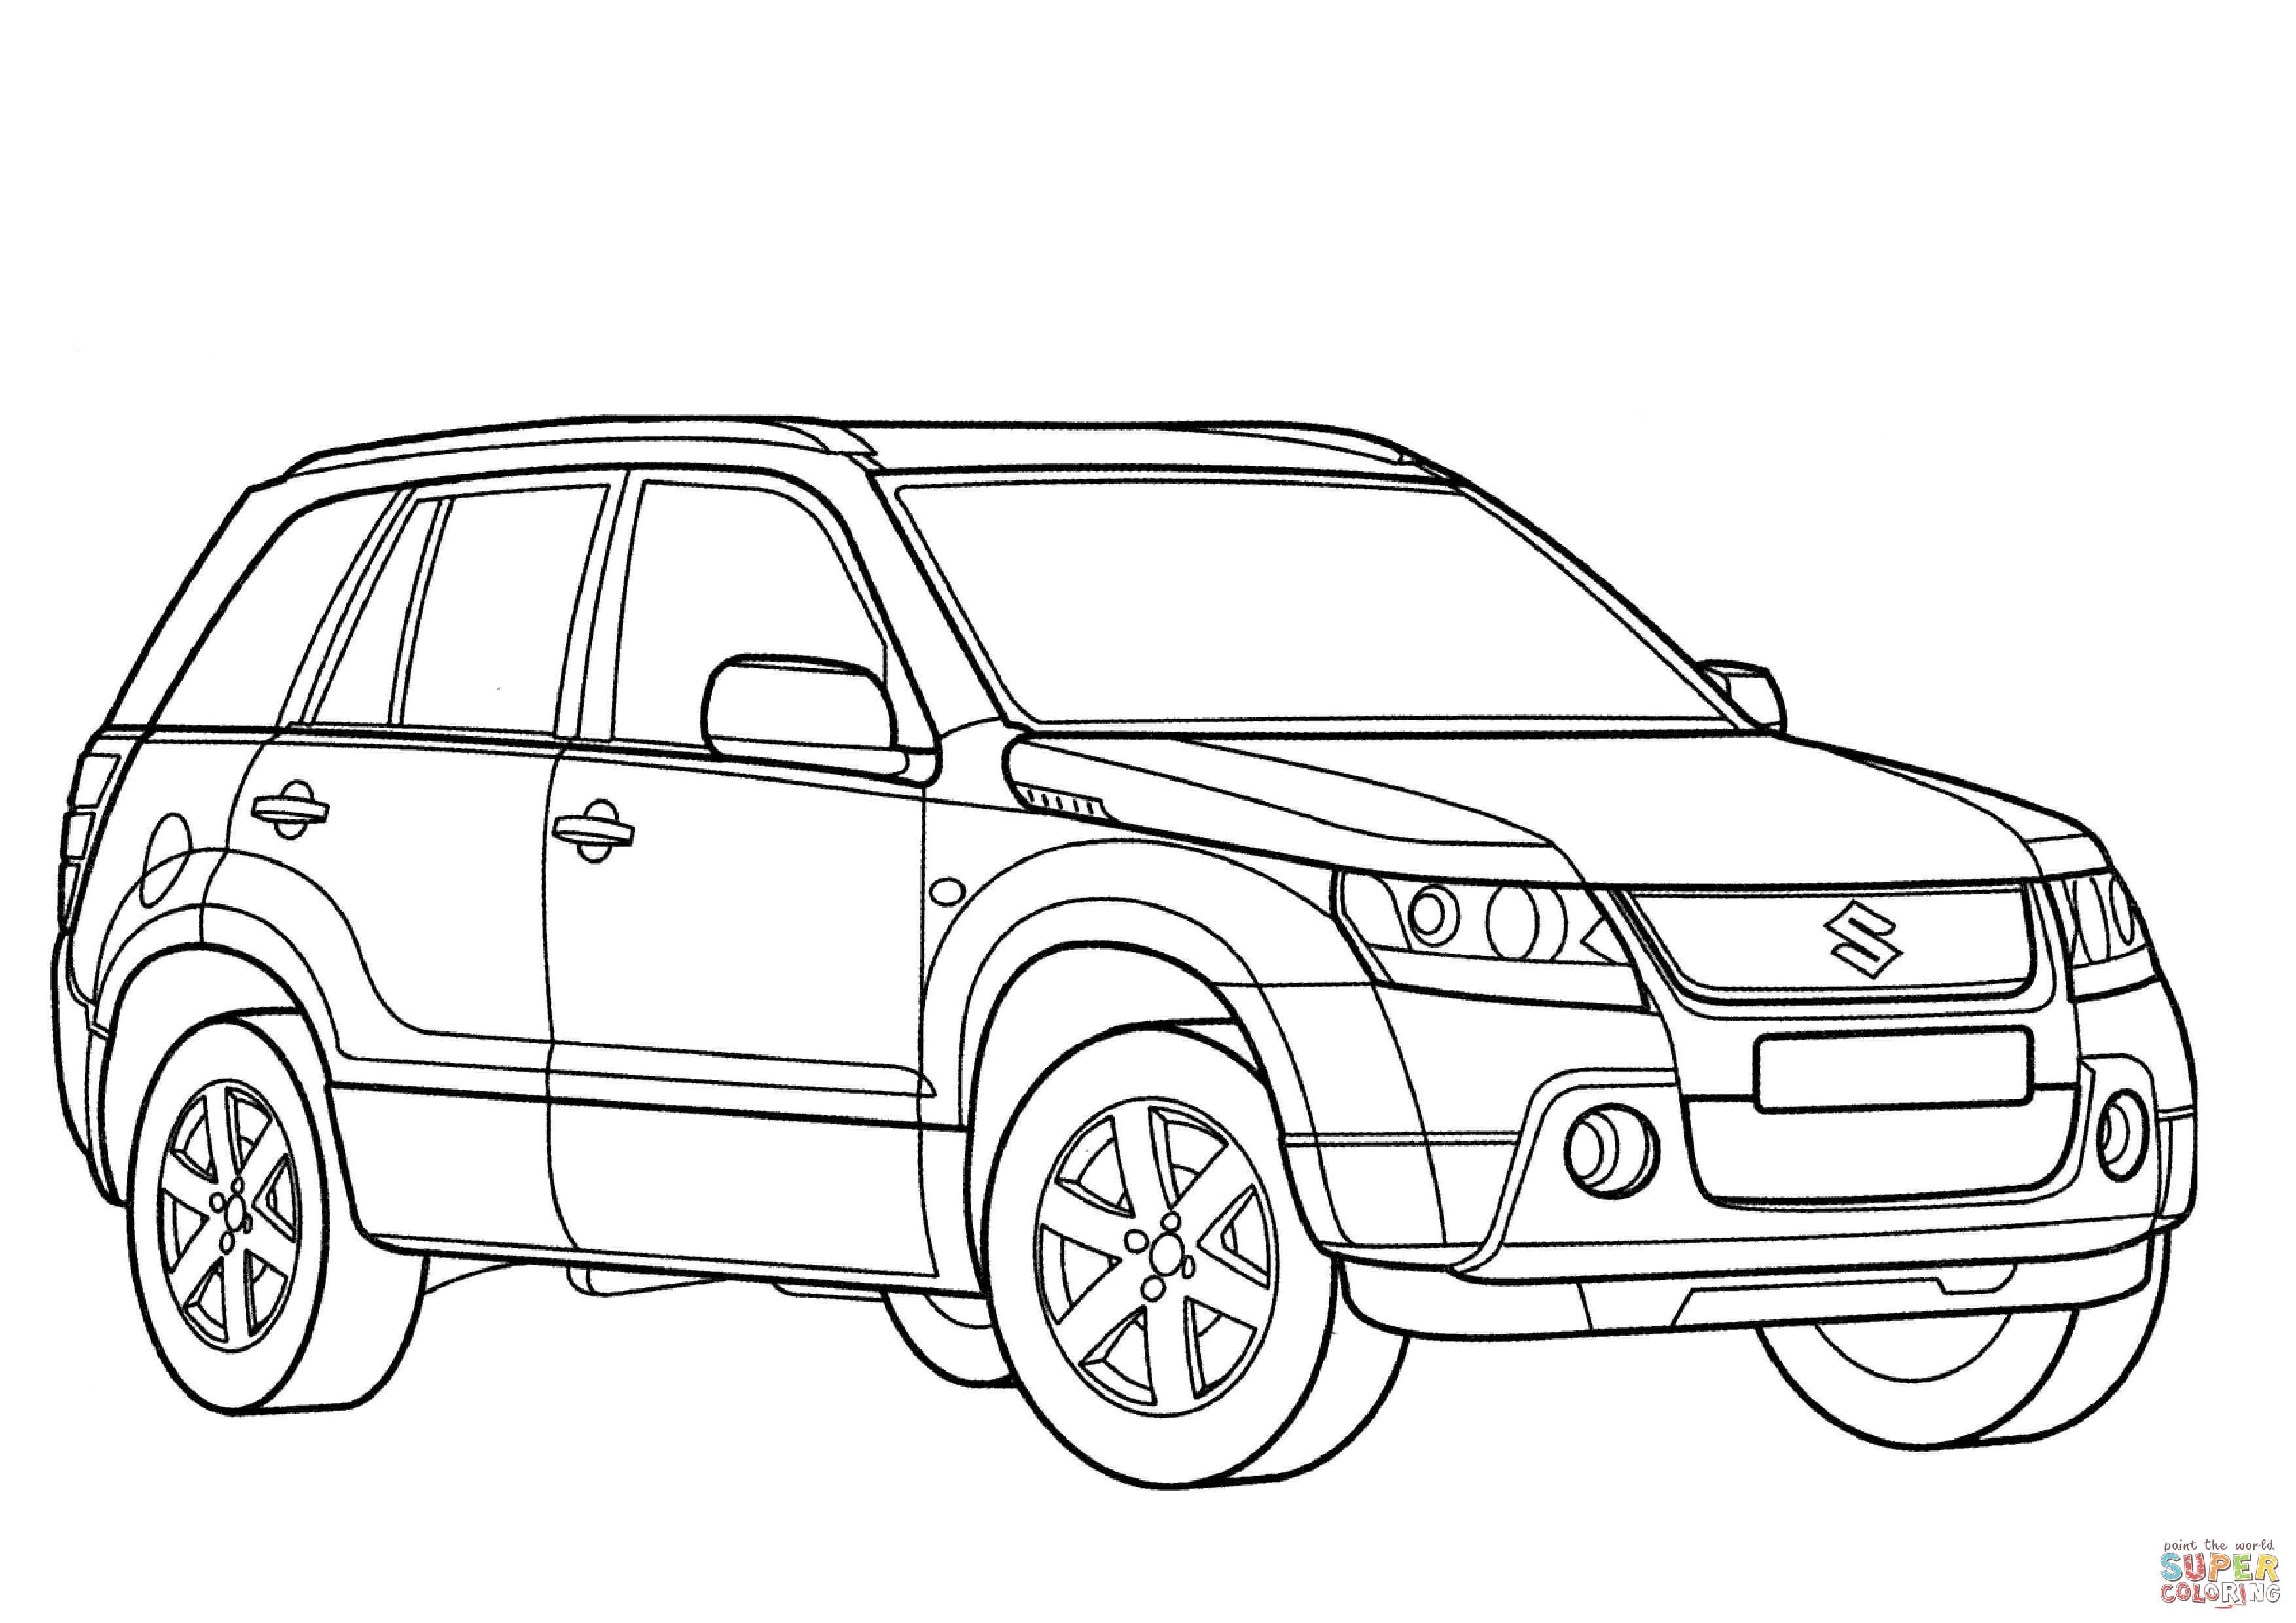 Suzuki Grand Vitara Coloring Page